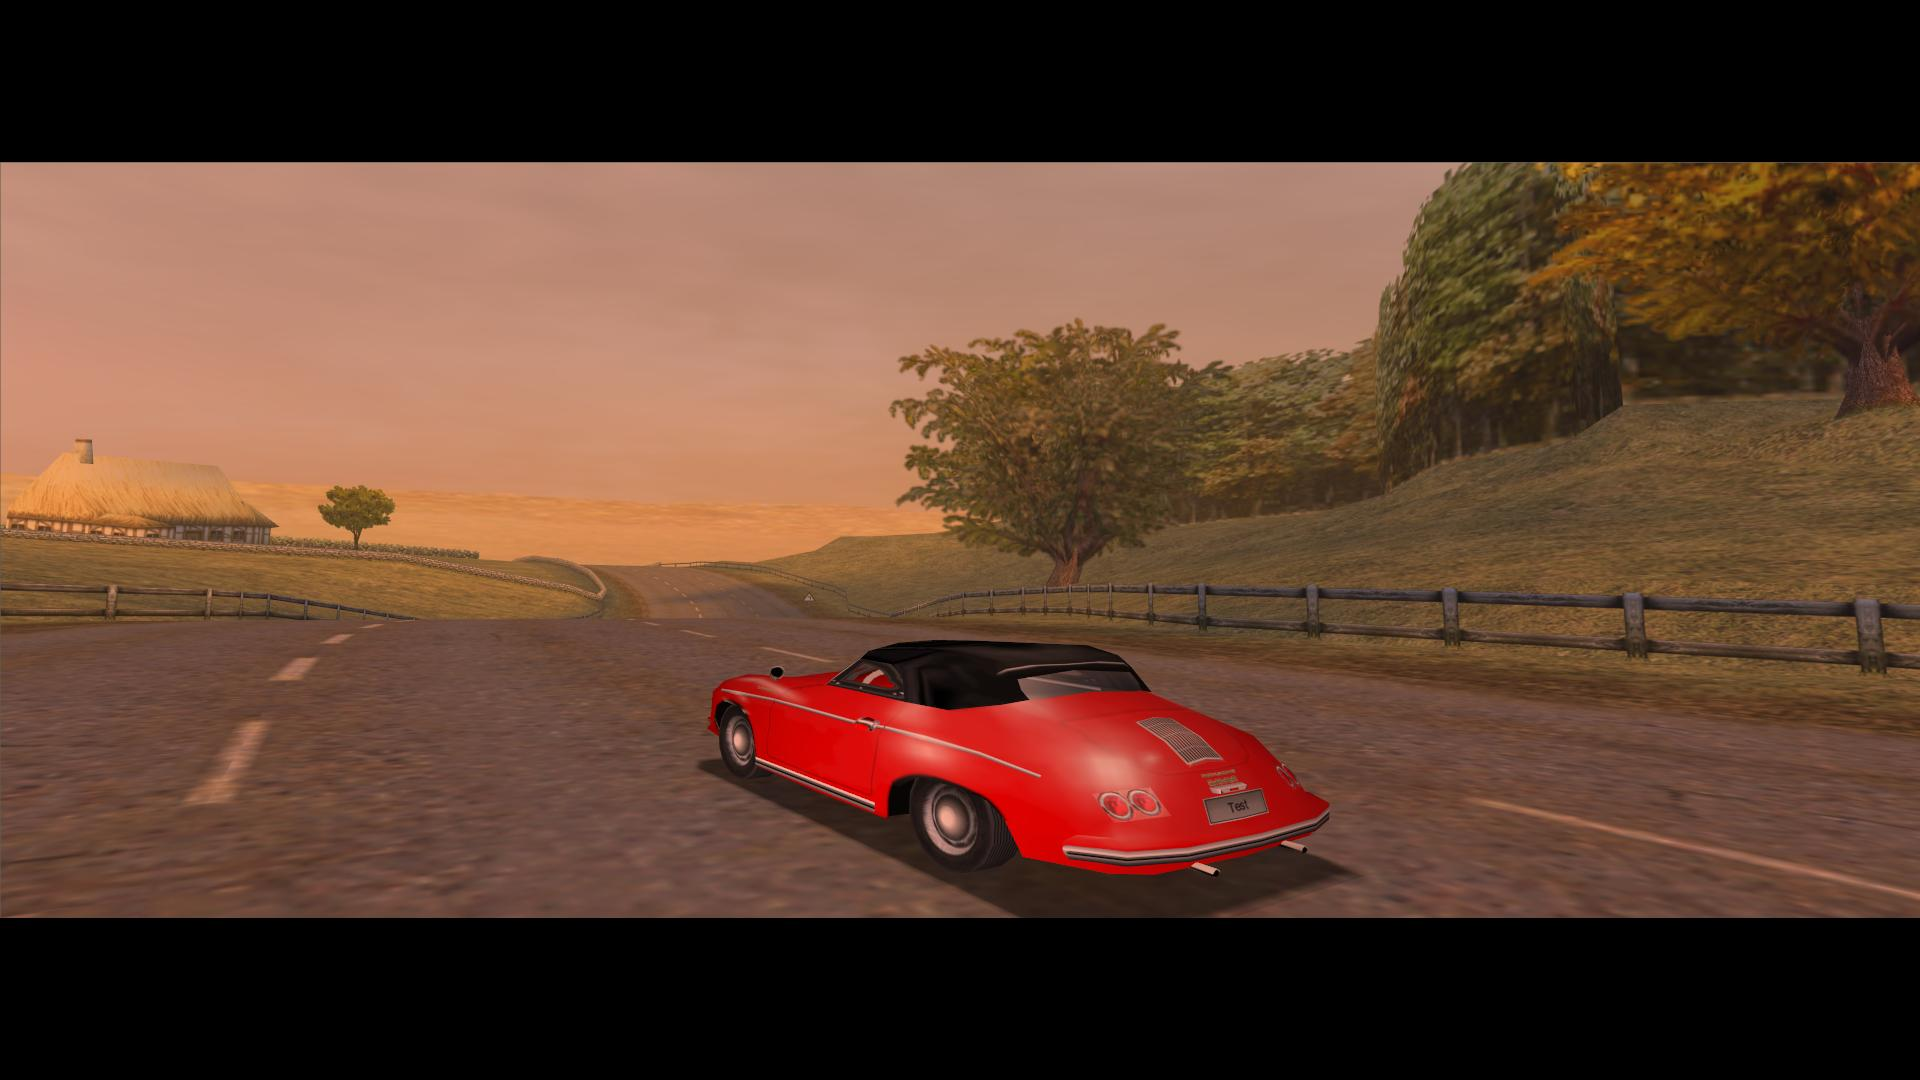 http://extreme.pcgameshardware.de/members/entelodon-albums-need-speed-porsche-5130-picture517271-need-speed-porsche-27.jpg